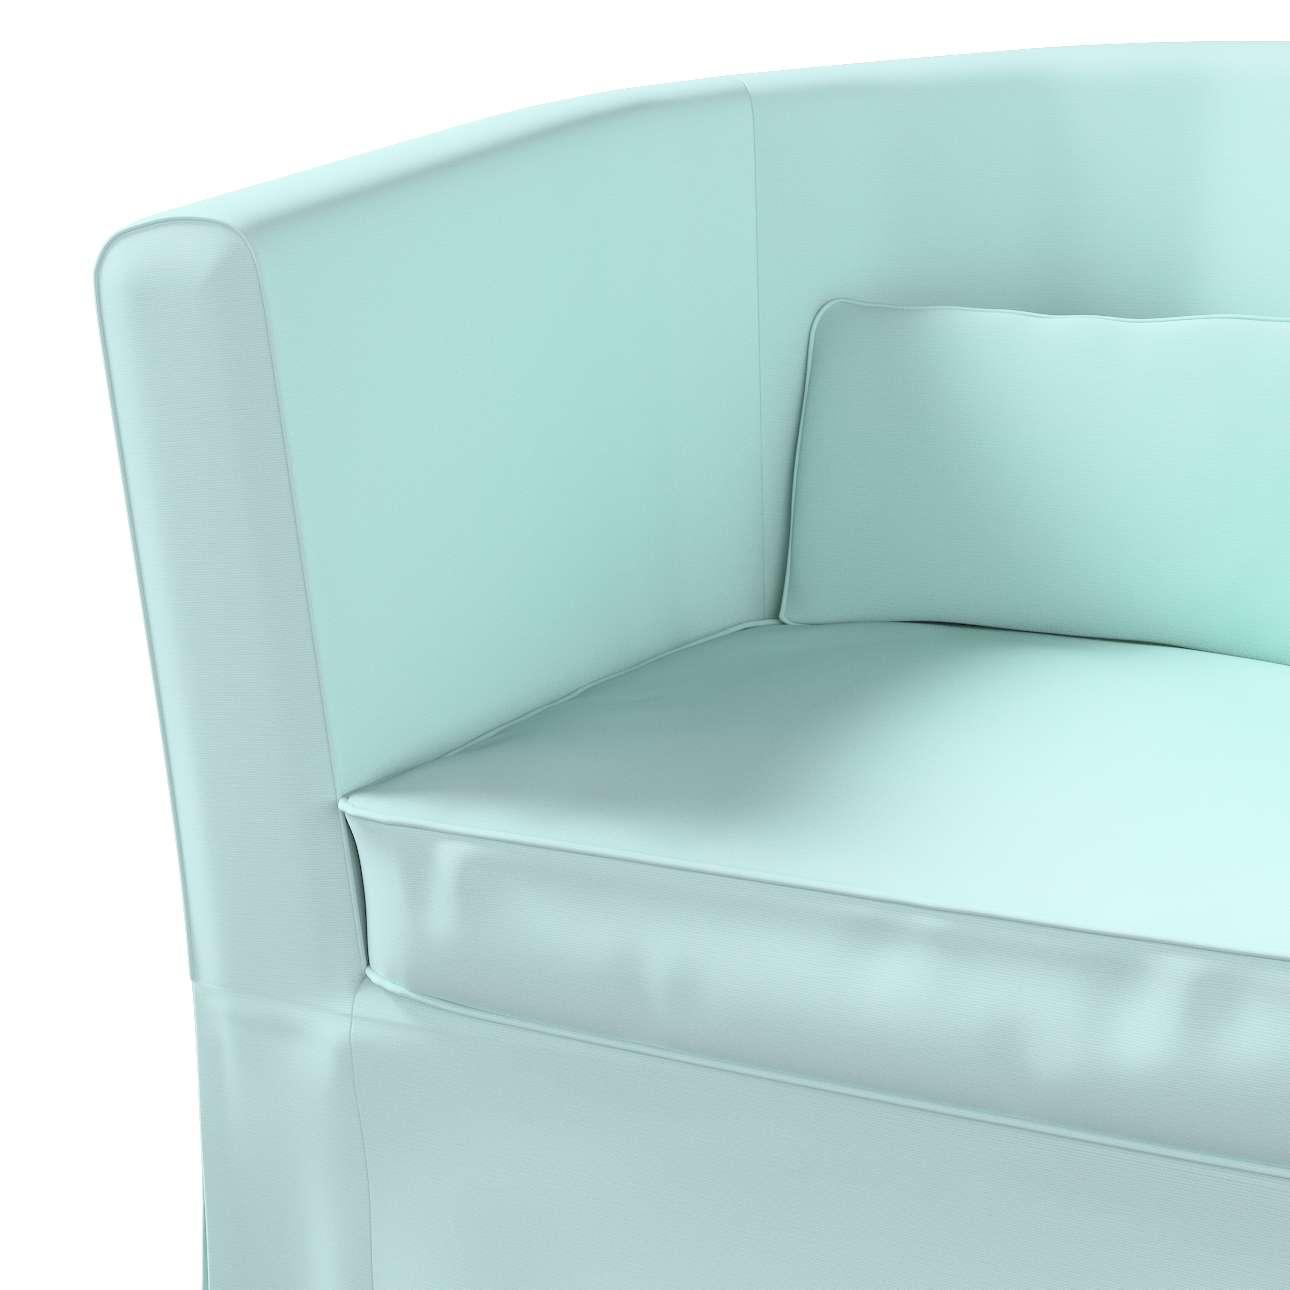 Ektorp Tullsta Sesselbezug von der Kollektion Cotton Panama, Stoff: 702-10